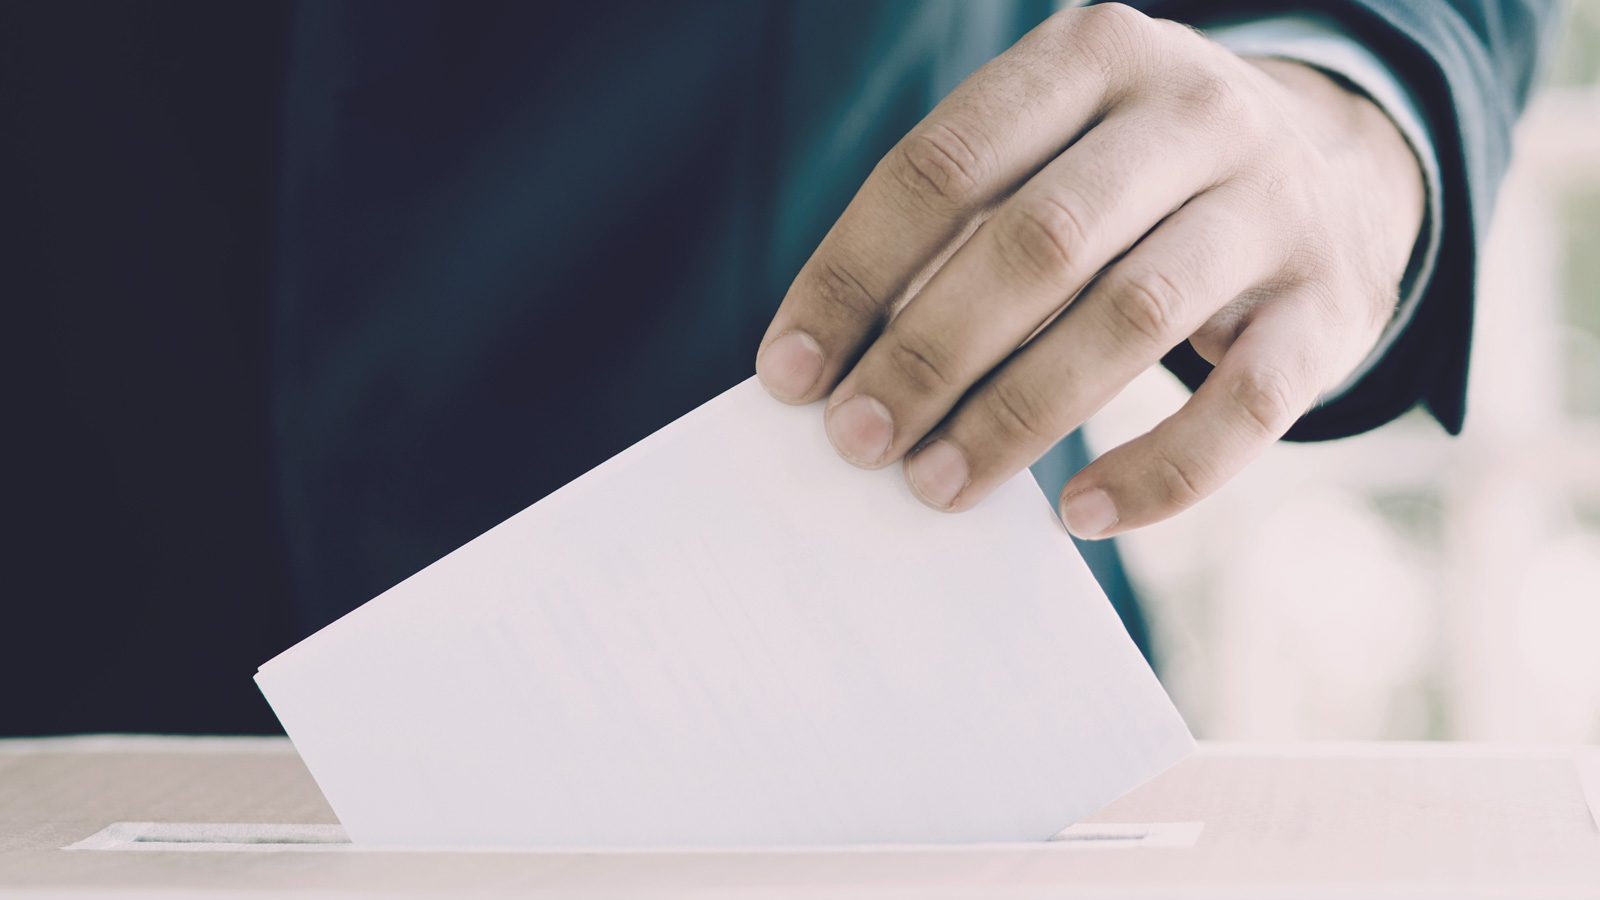 A hand posting a voting slip into a ballot box